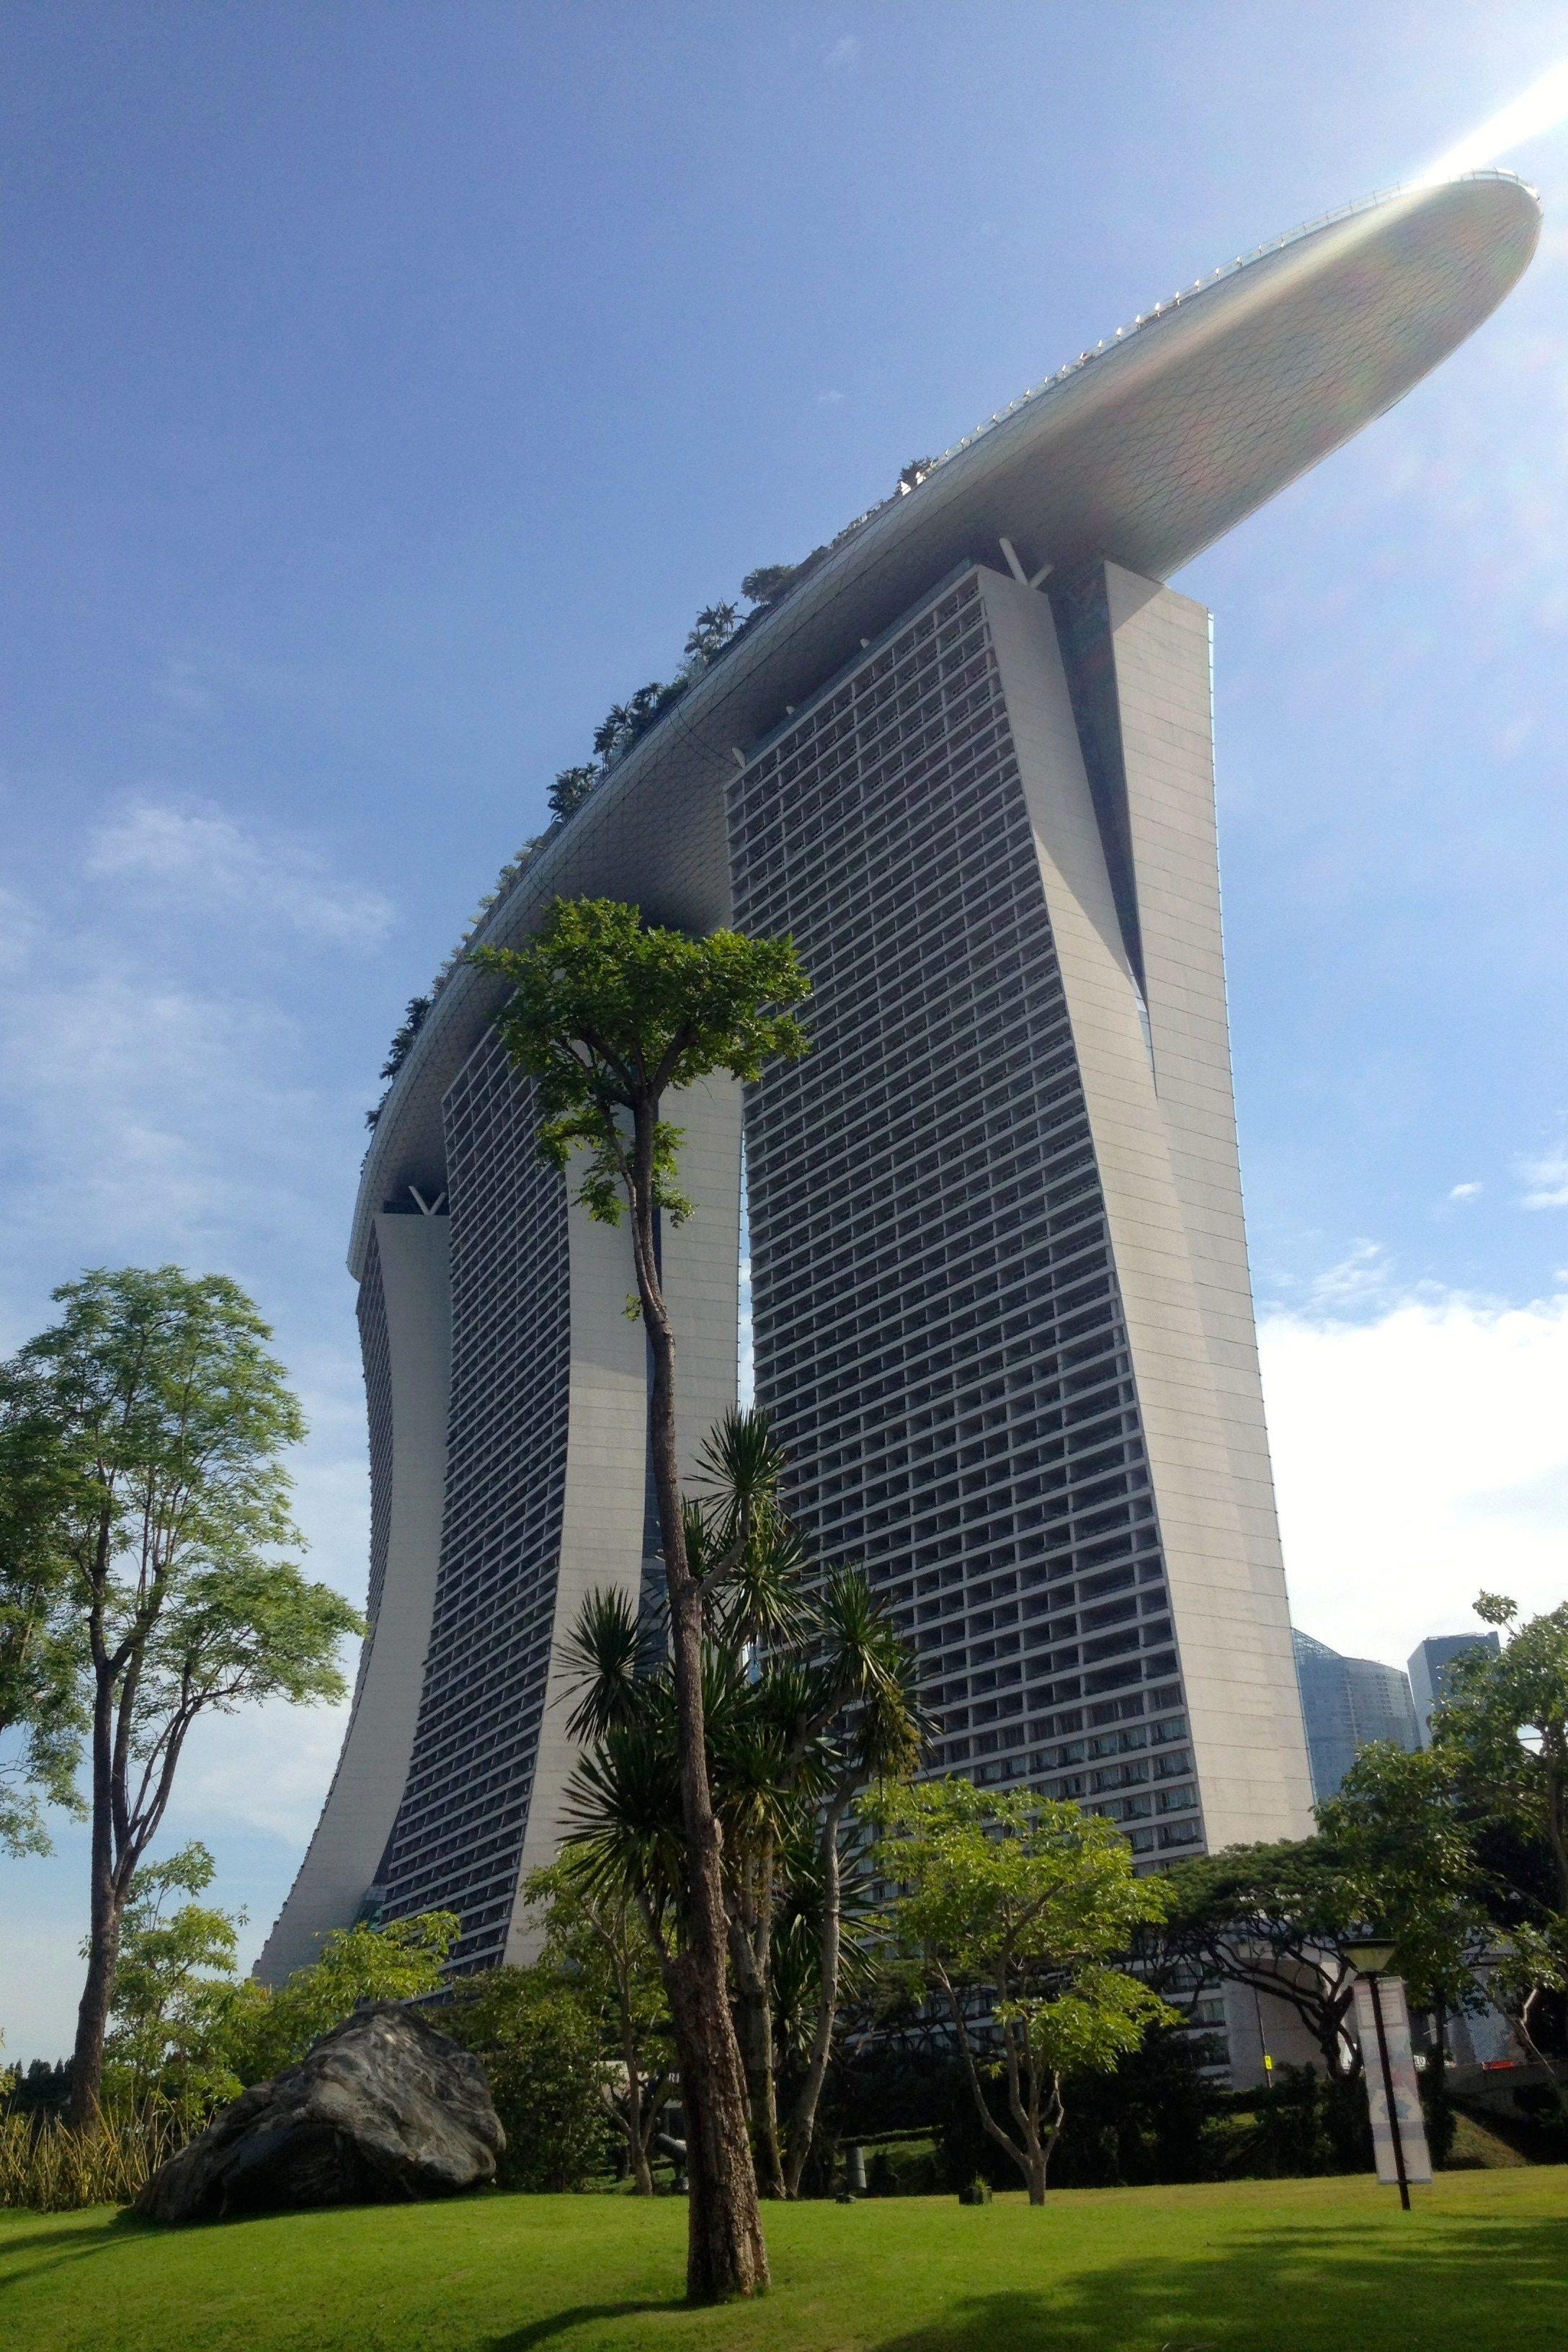 singapore marina hotel sky architecture grass city building structure